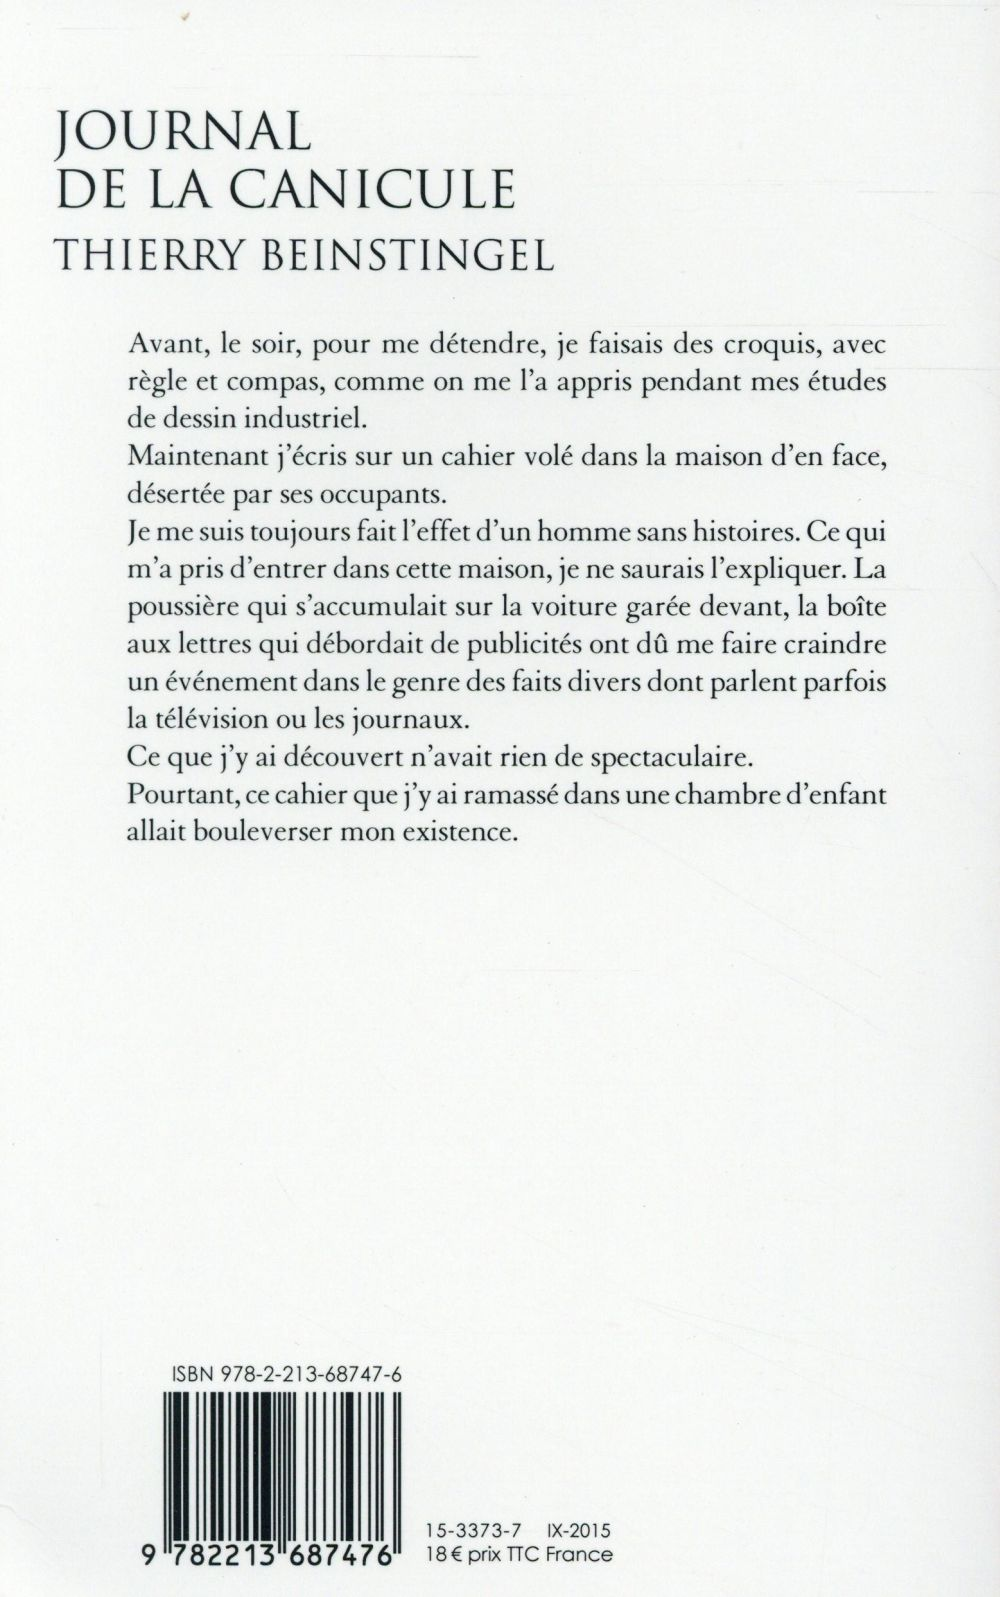 Journal de la canicule